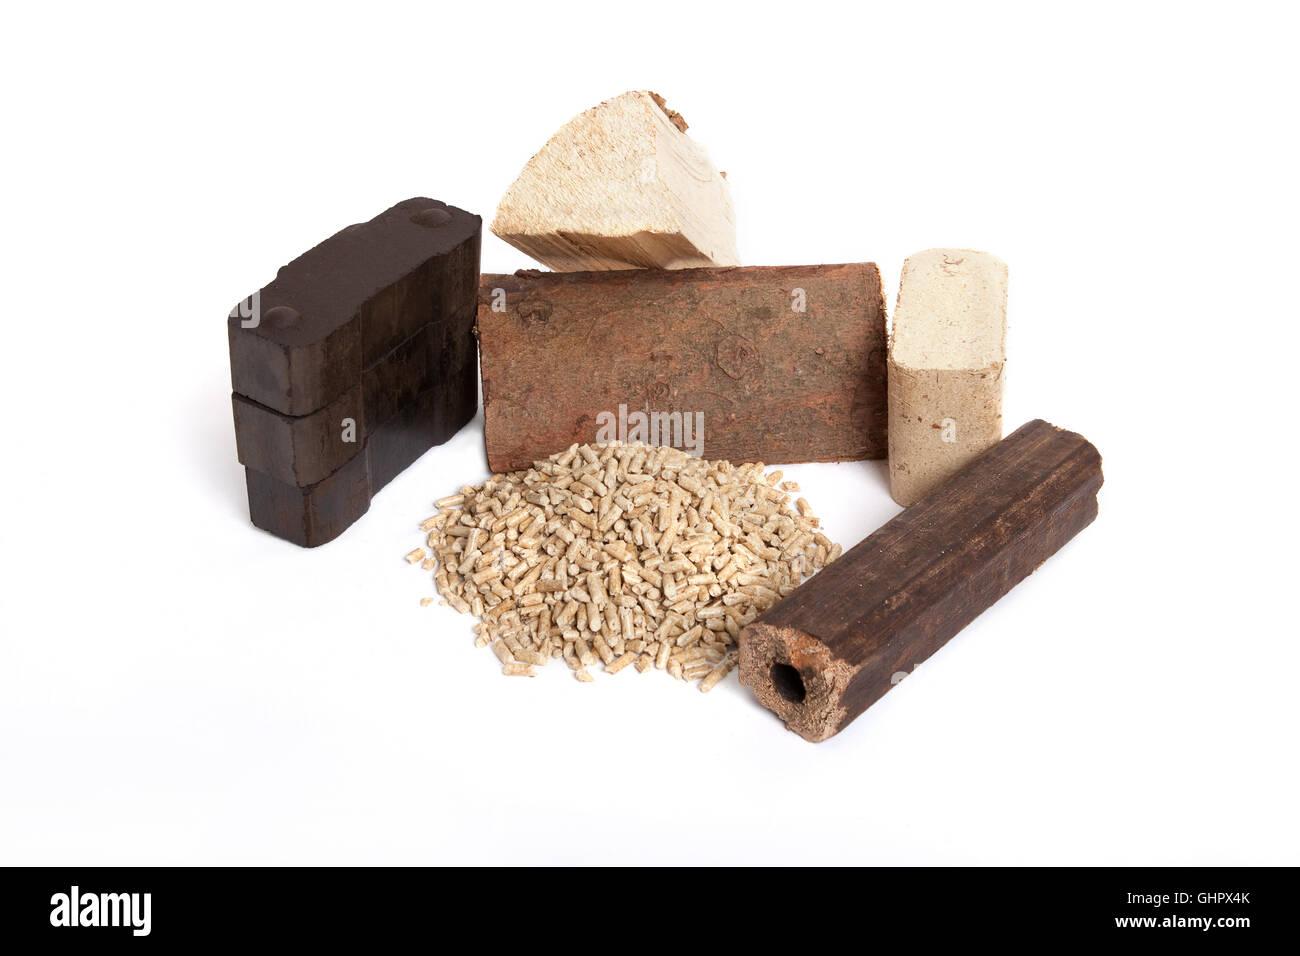 Diferentes combustibles fósiles sobre fondo blanco, carbono, ovenwood, pellets, briquetas, Imagen De Stock